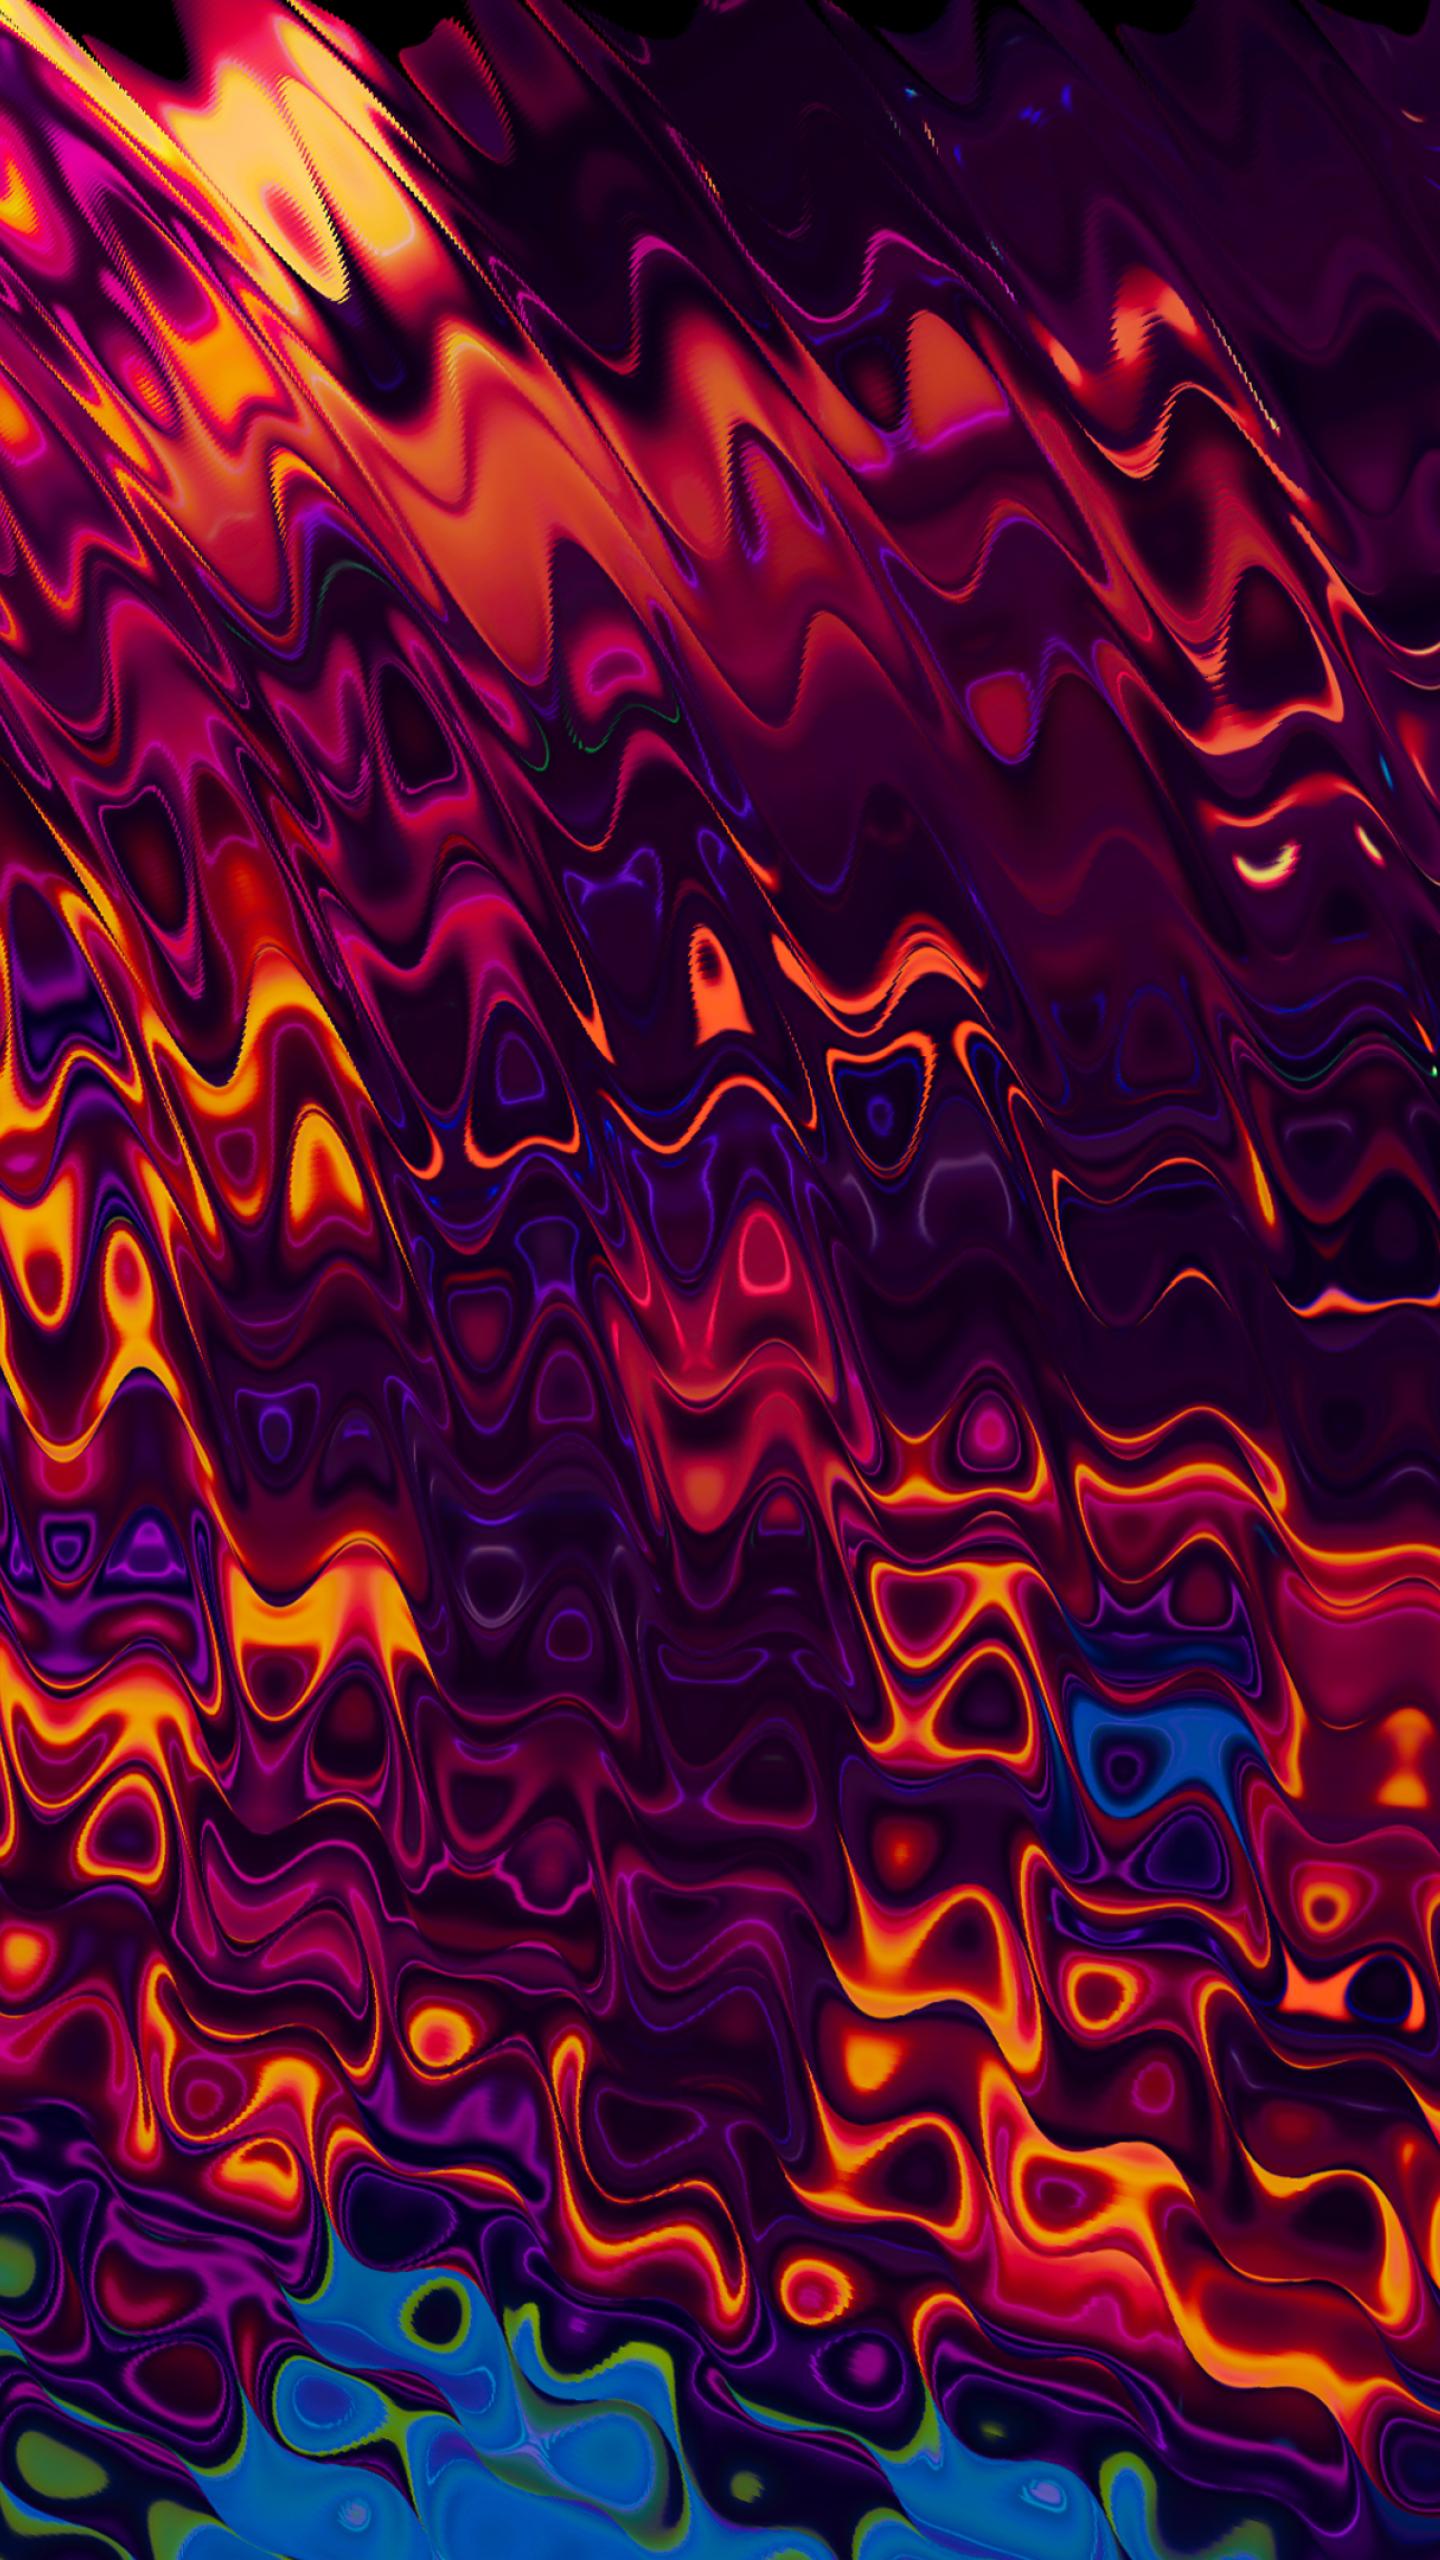 1440x2560 Abstract Swirly Wall Samsung Galaxy S6,S7,Google